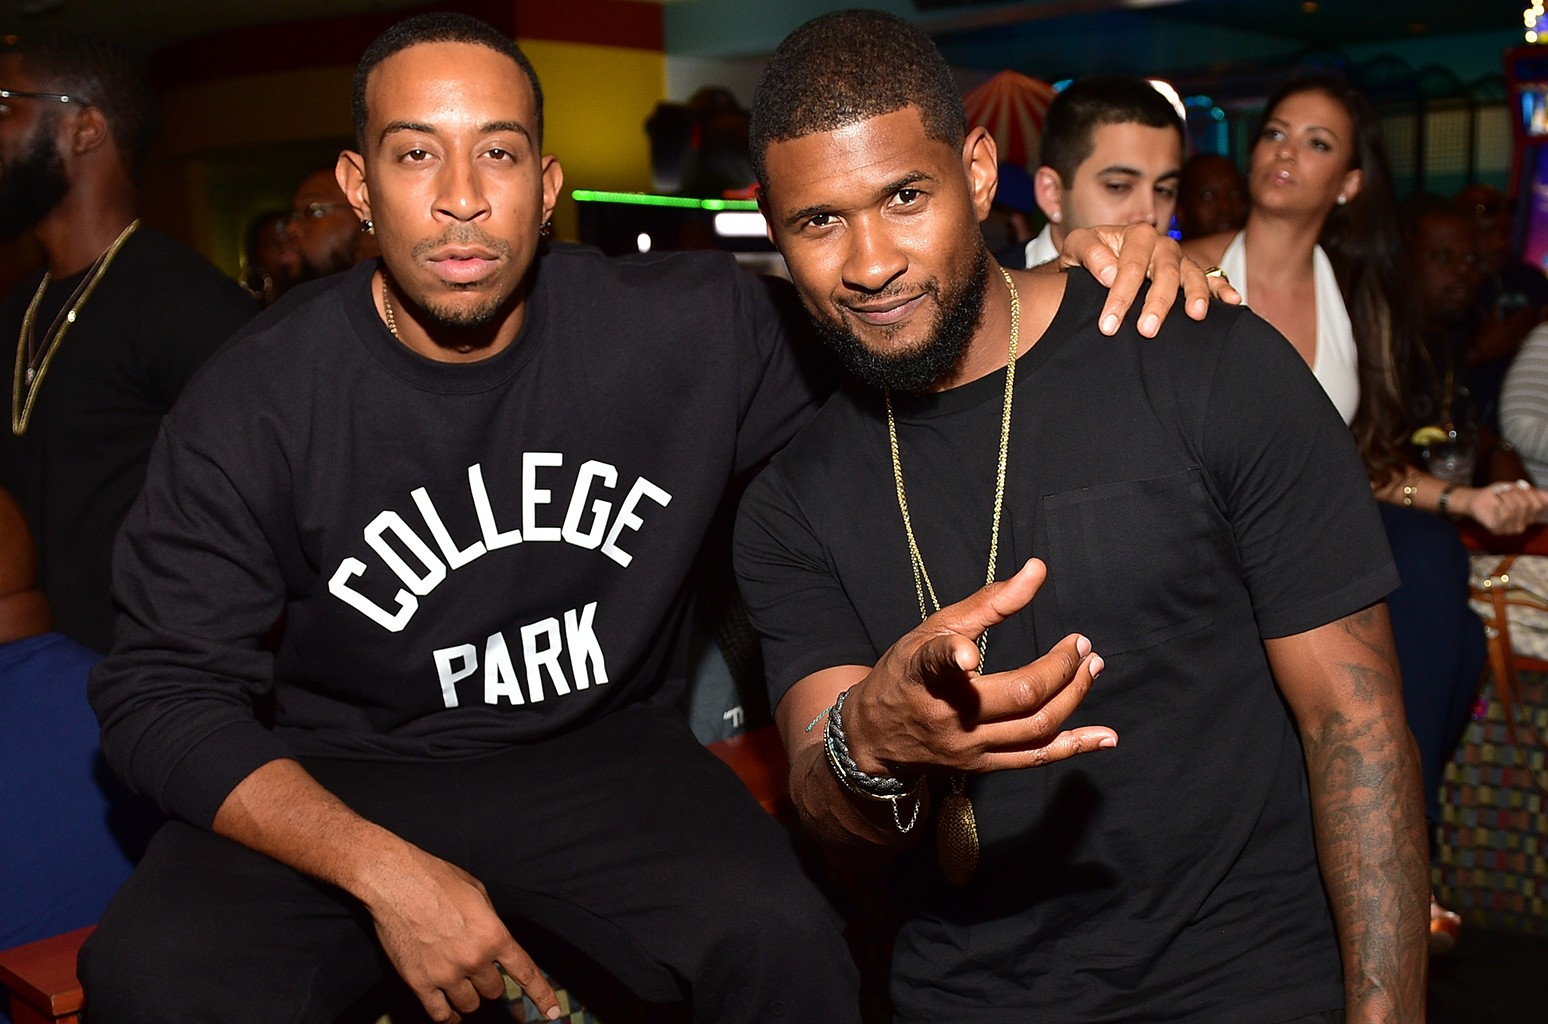 Ludacris and Usher at Bowlmor lanes on Sept. 3, 2015 in Atlanta.